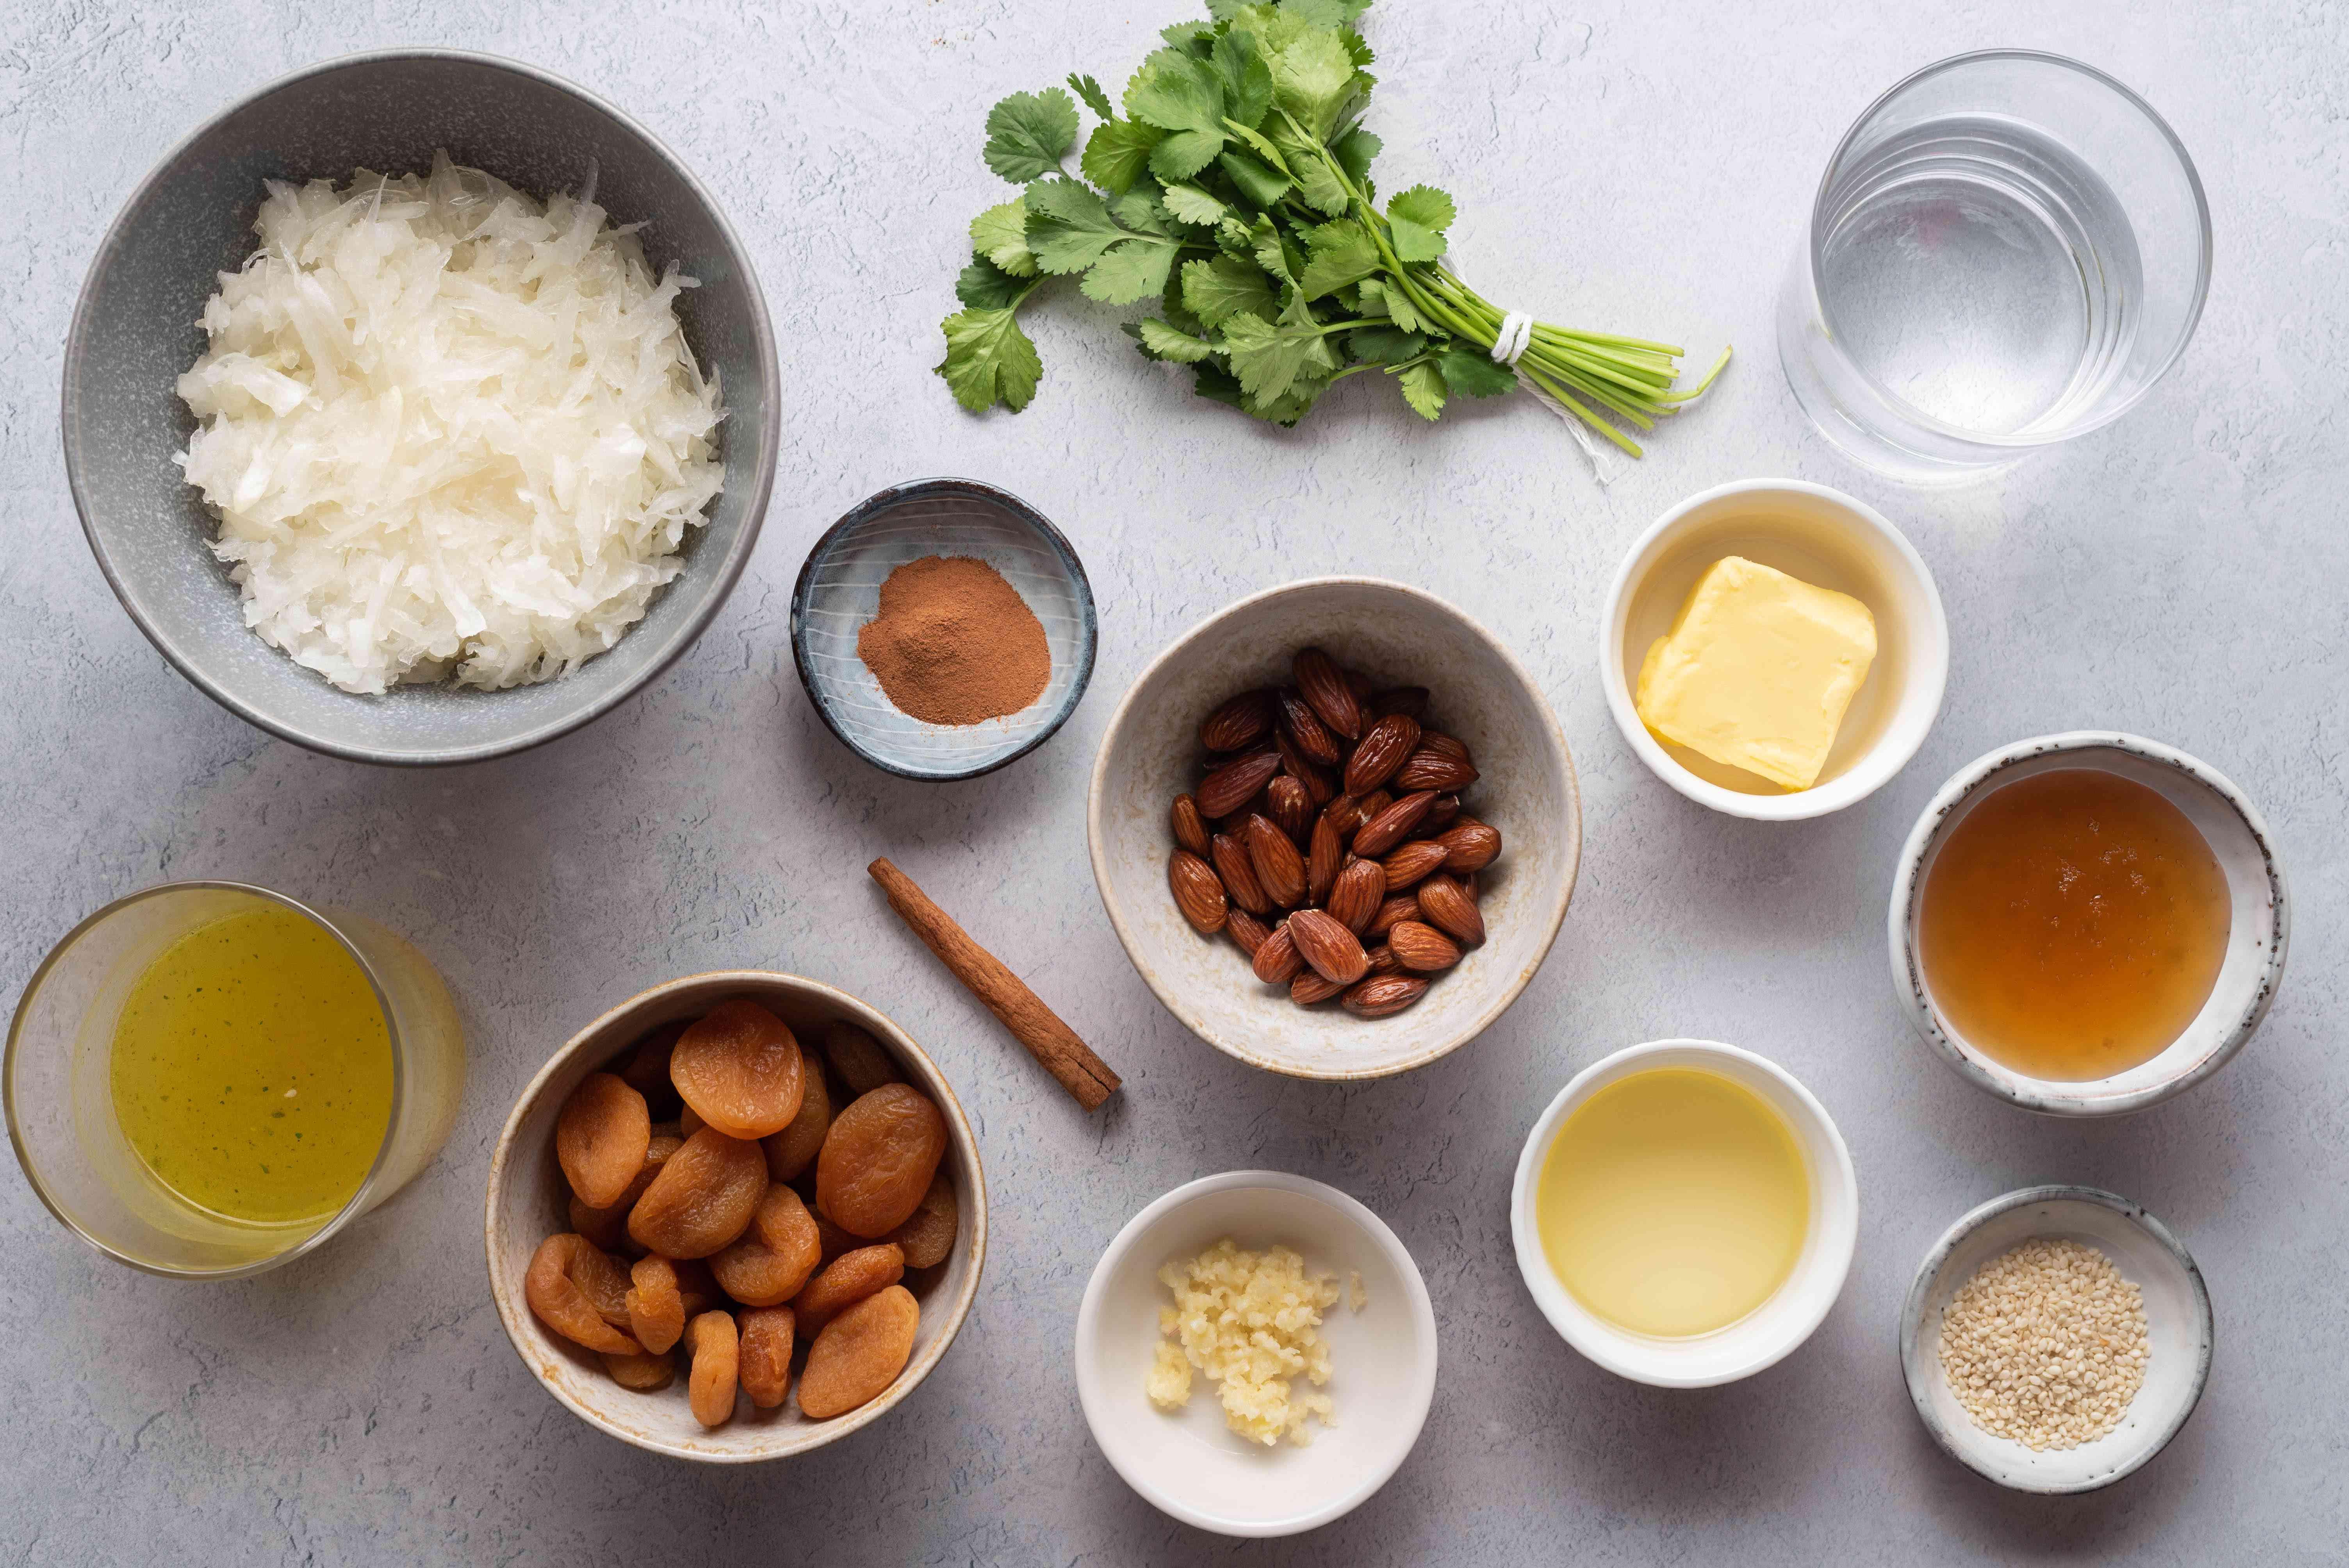 tagine ingredients gathered